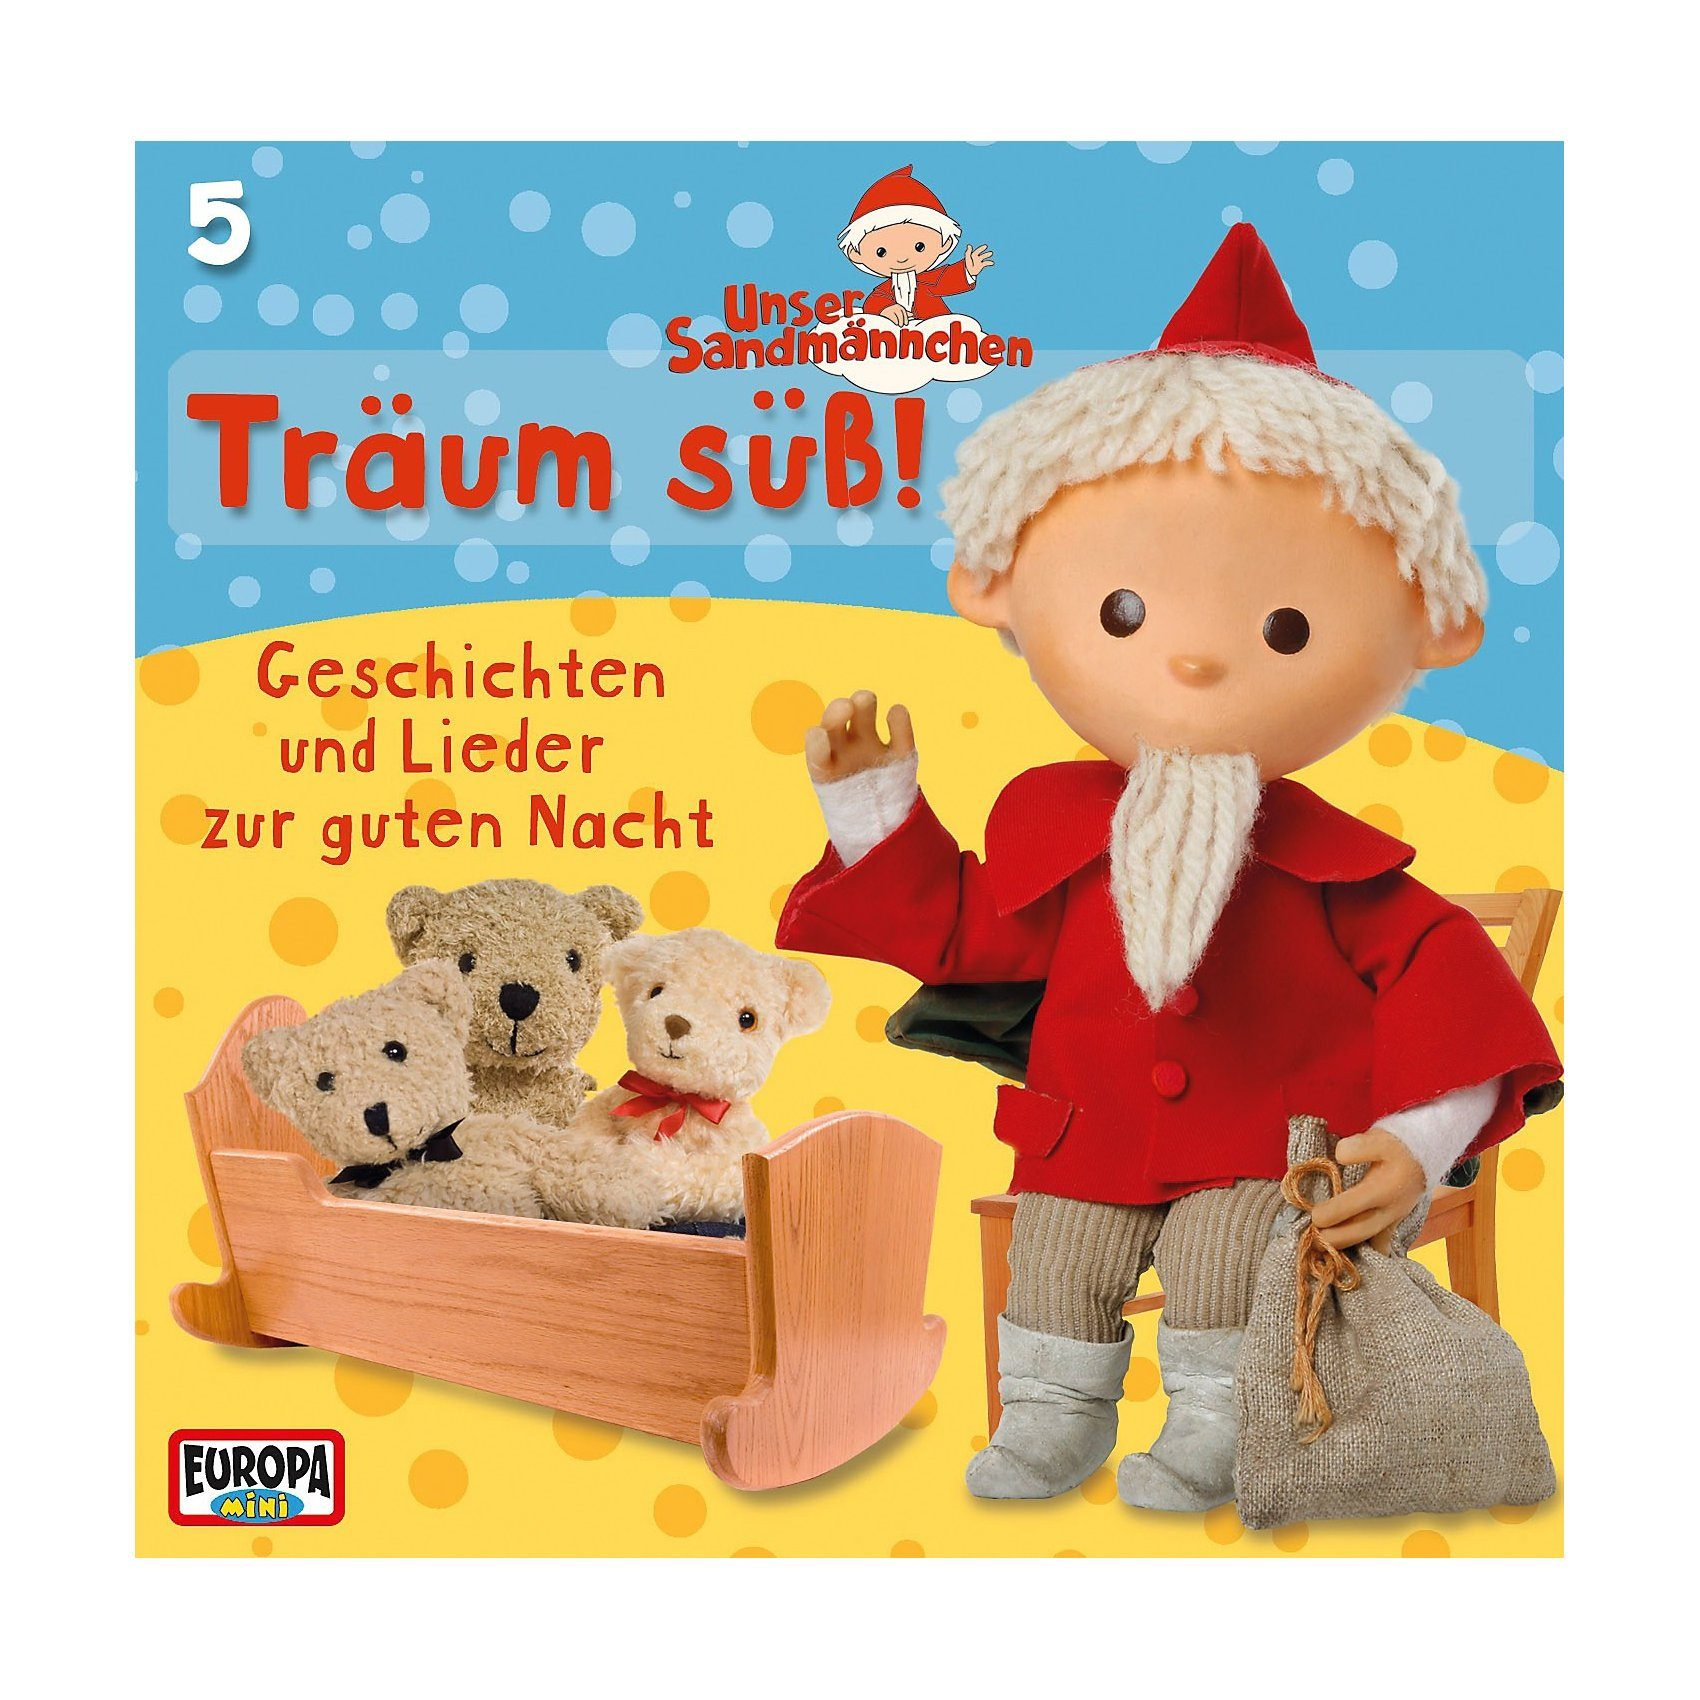 SONY BMG MUSIC CD Unser Sandmännchen 5 - Träum süß!